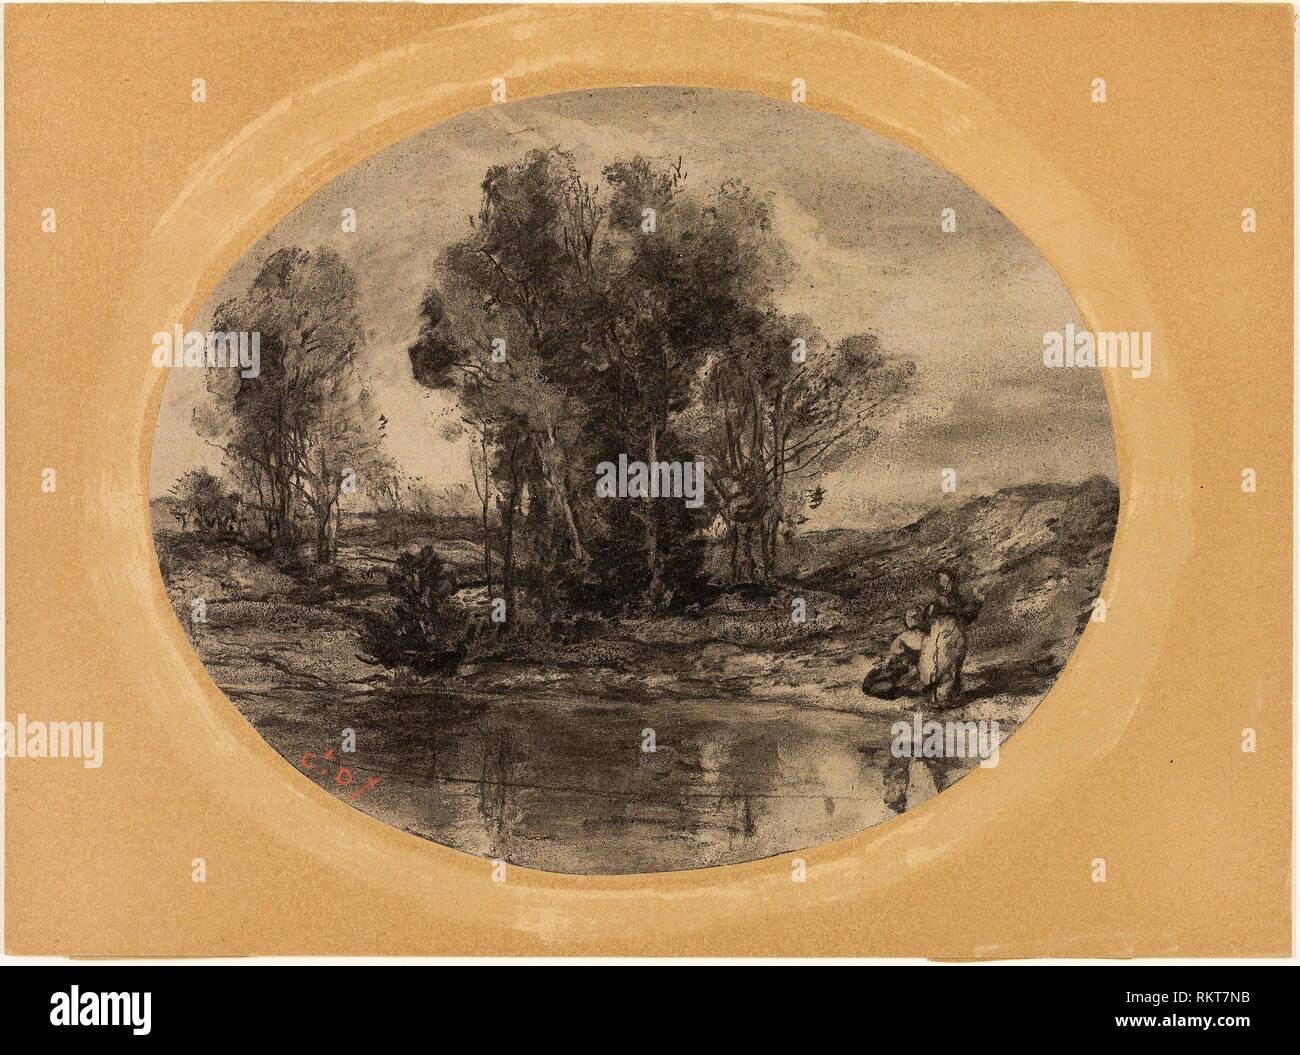 Figures by a Pond - 1855/60 - Henri Joseph Constant Dutilleux French, 1807-1865 - Artist: Henri Joseph Constant Dutilleux, Origin: France, Date: - Stock Image